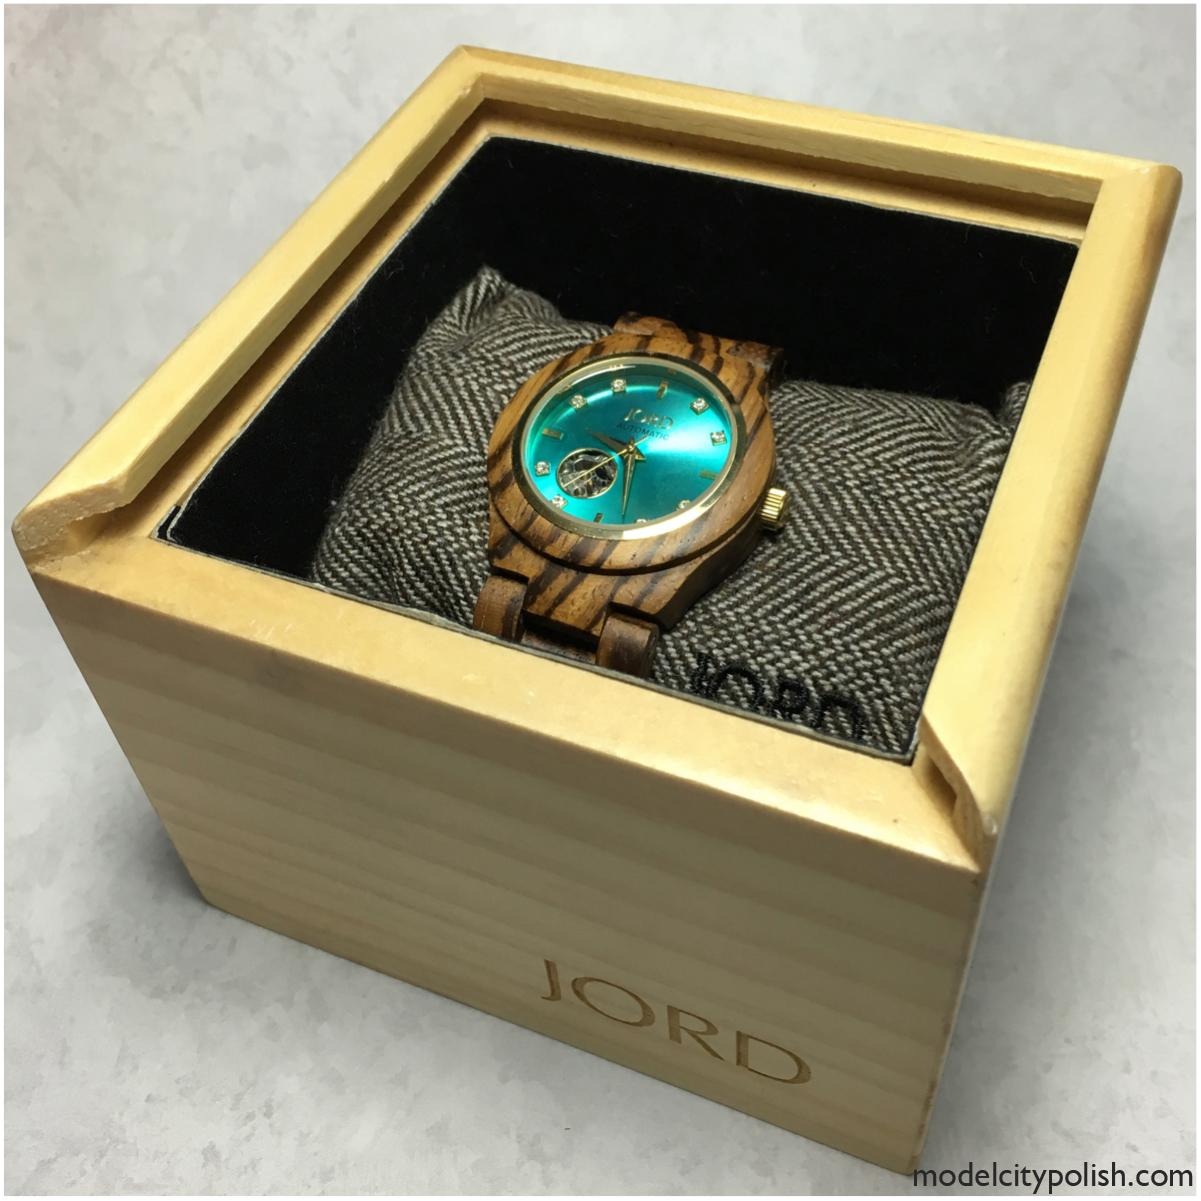 Jord Watch 2